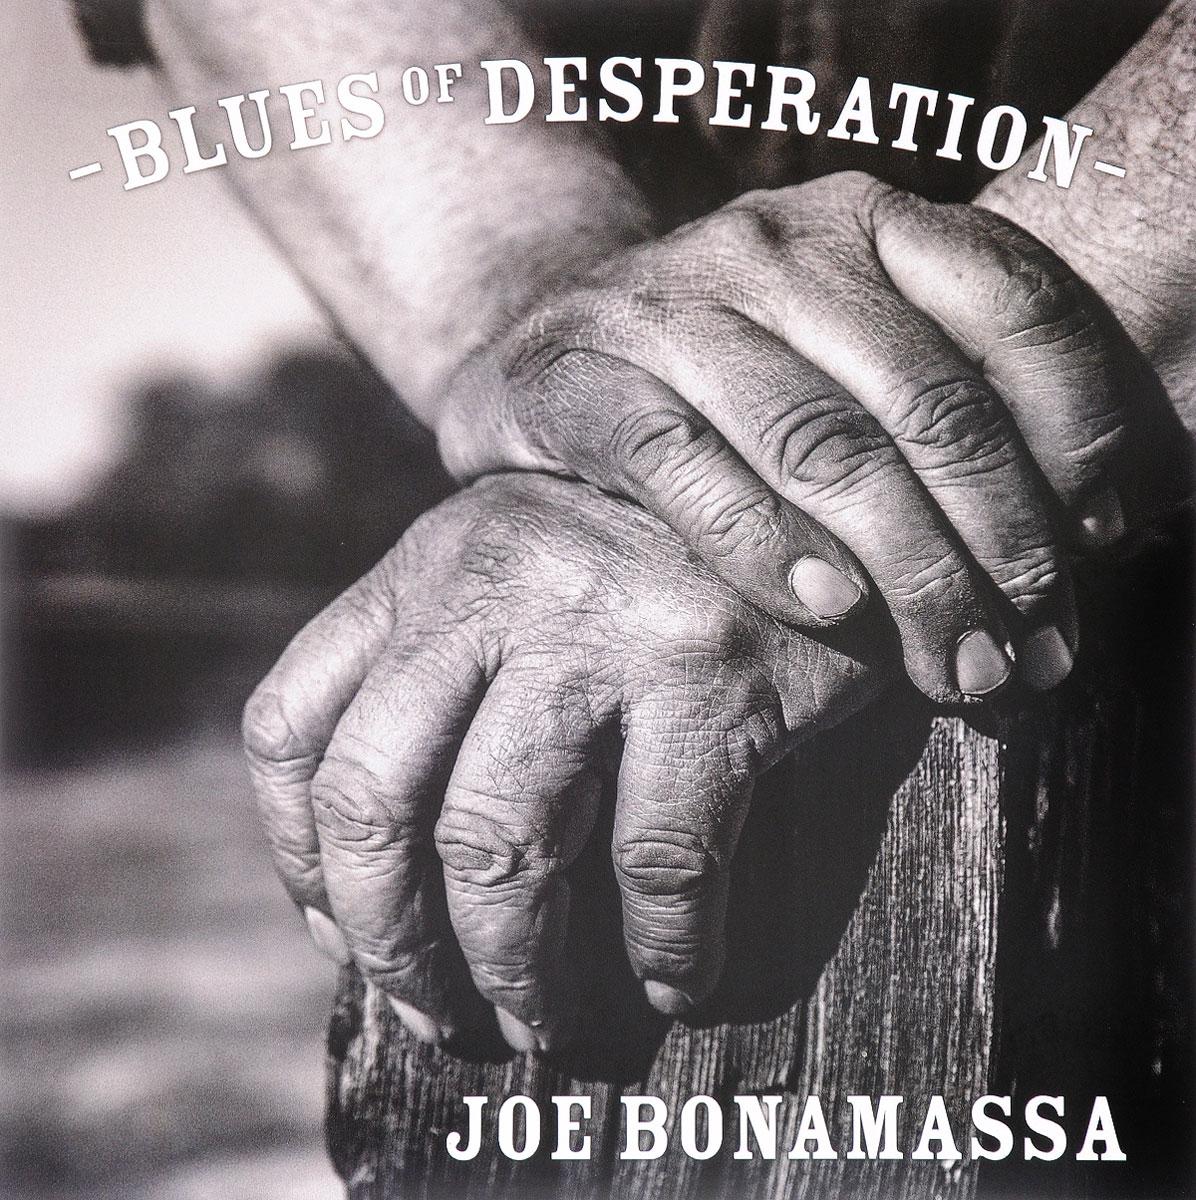 цена на Джо Бонамасса Joe Bonamassa. Blues Of Desperation (2 LP)